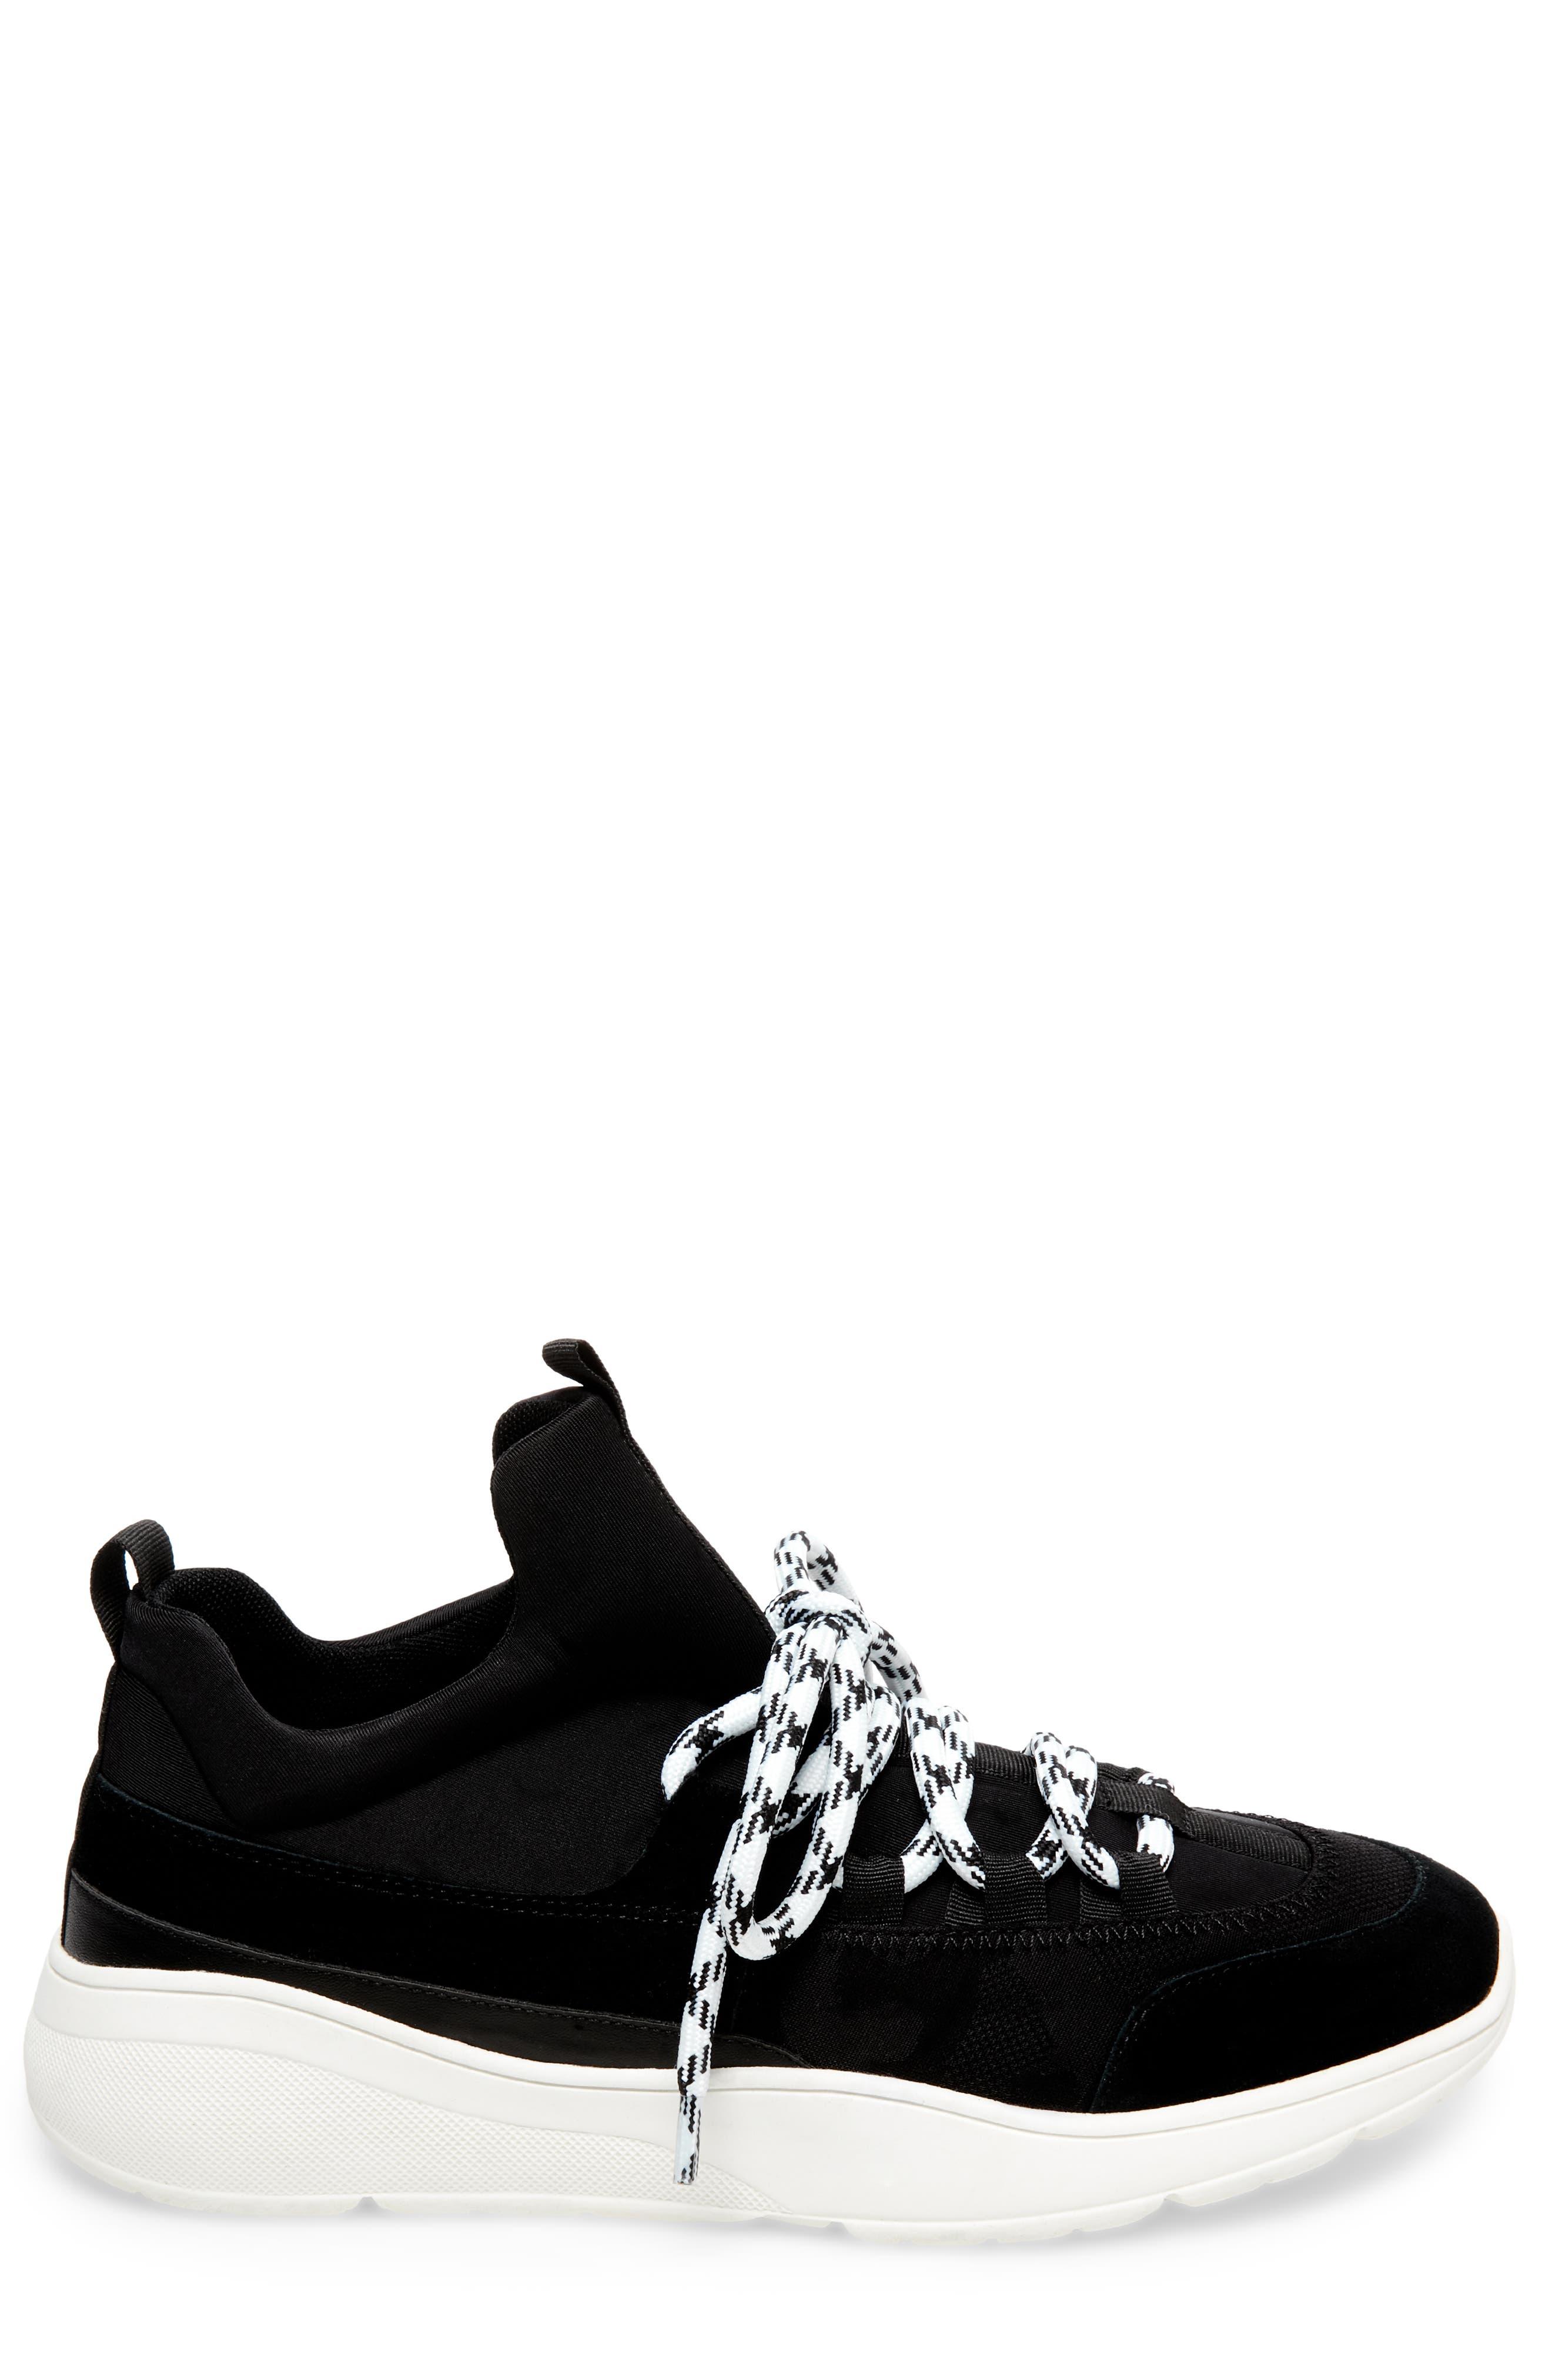 Baltic Sneaker,                             Alternate thumbnail 2, color,                             BLACK